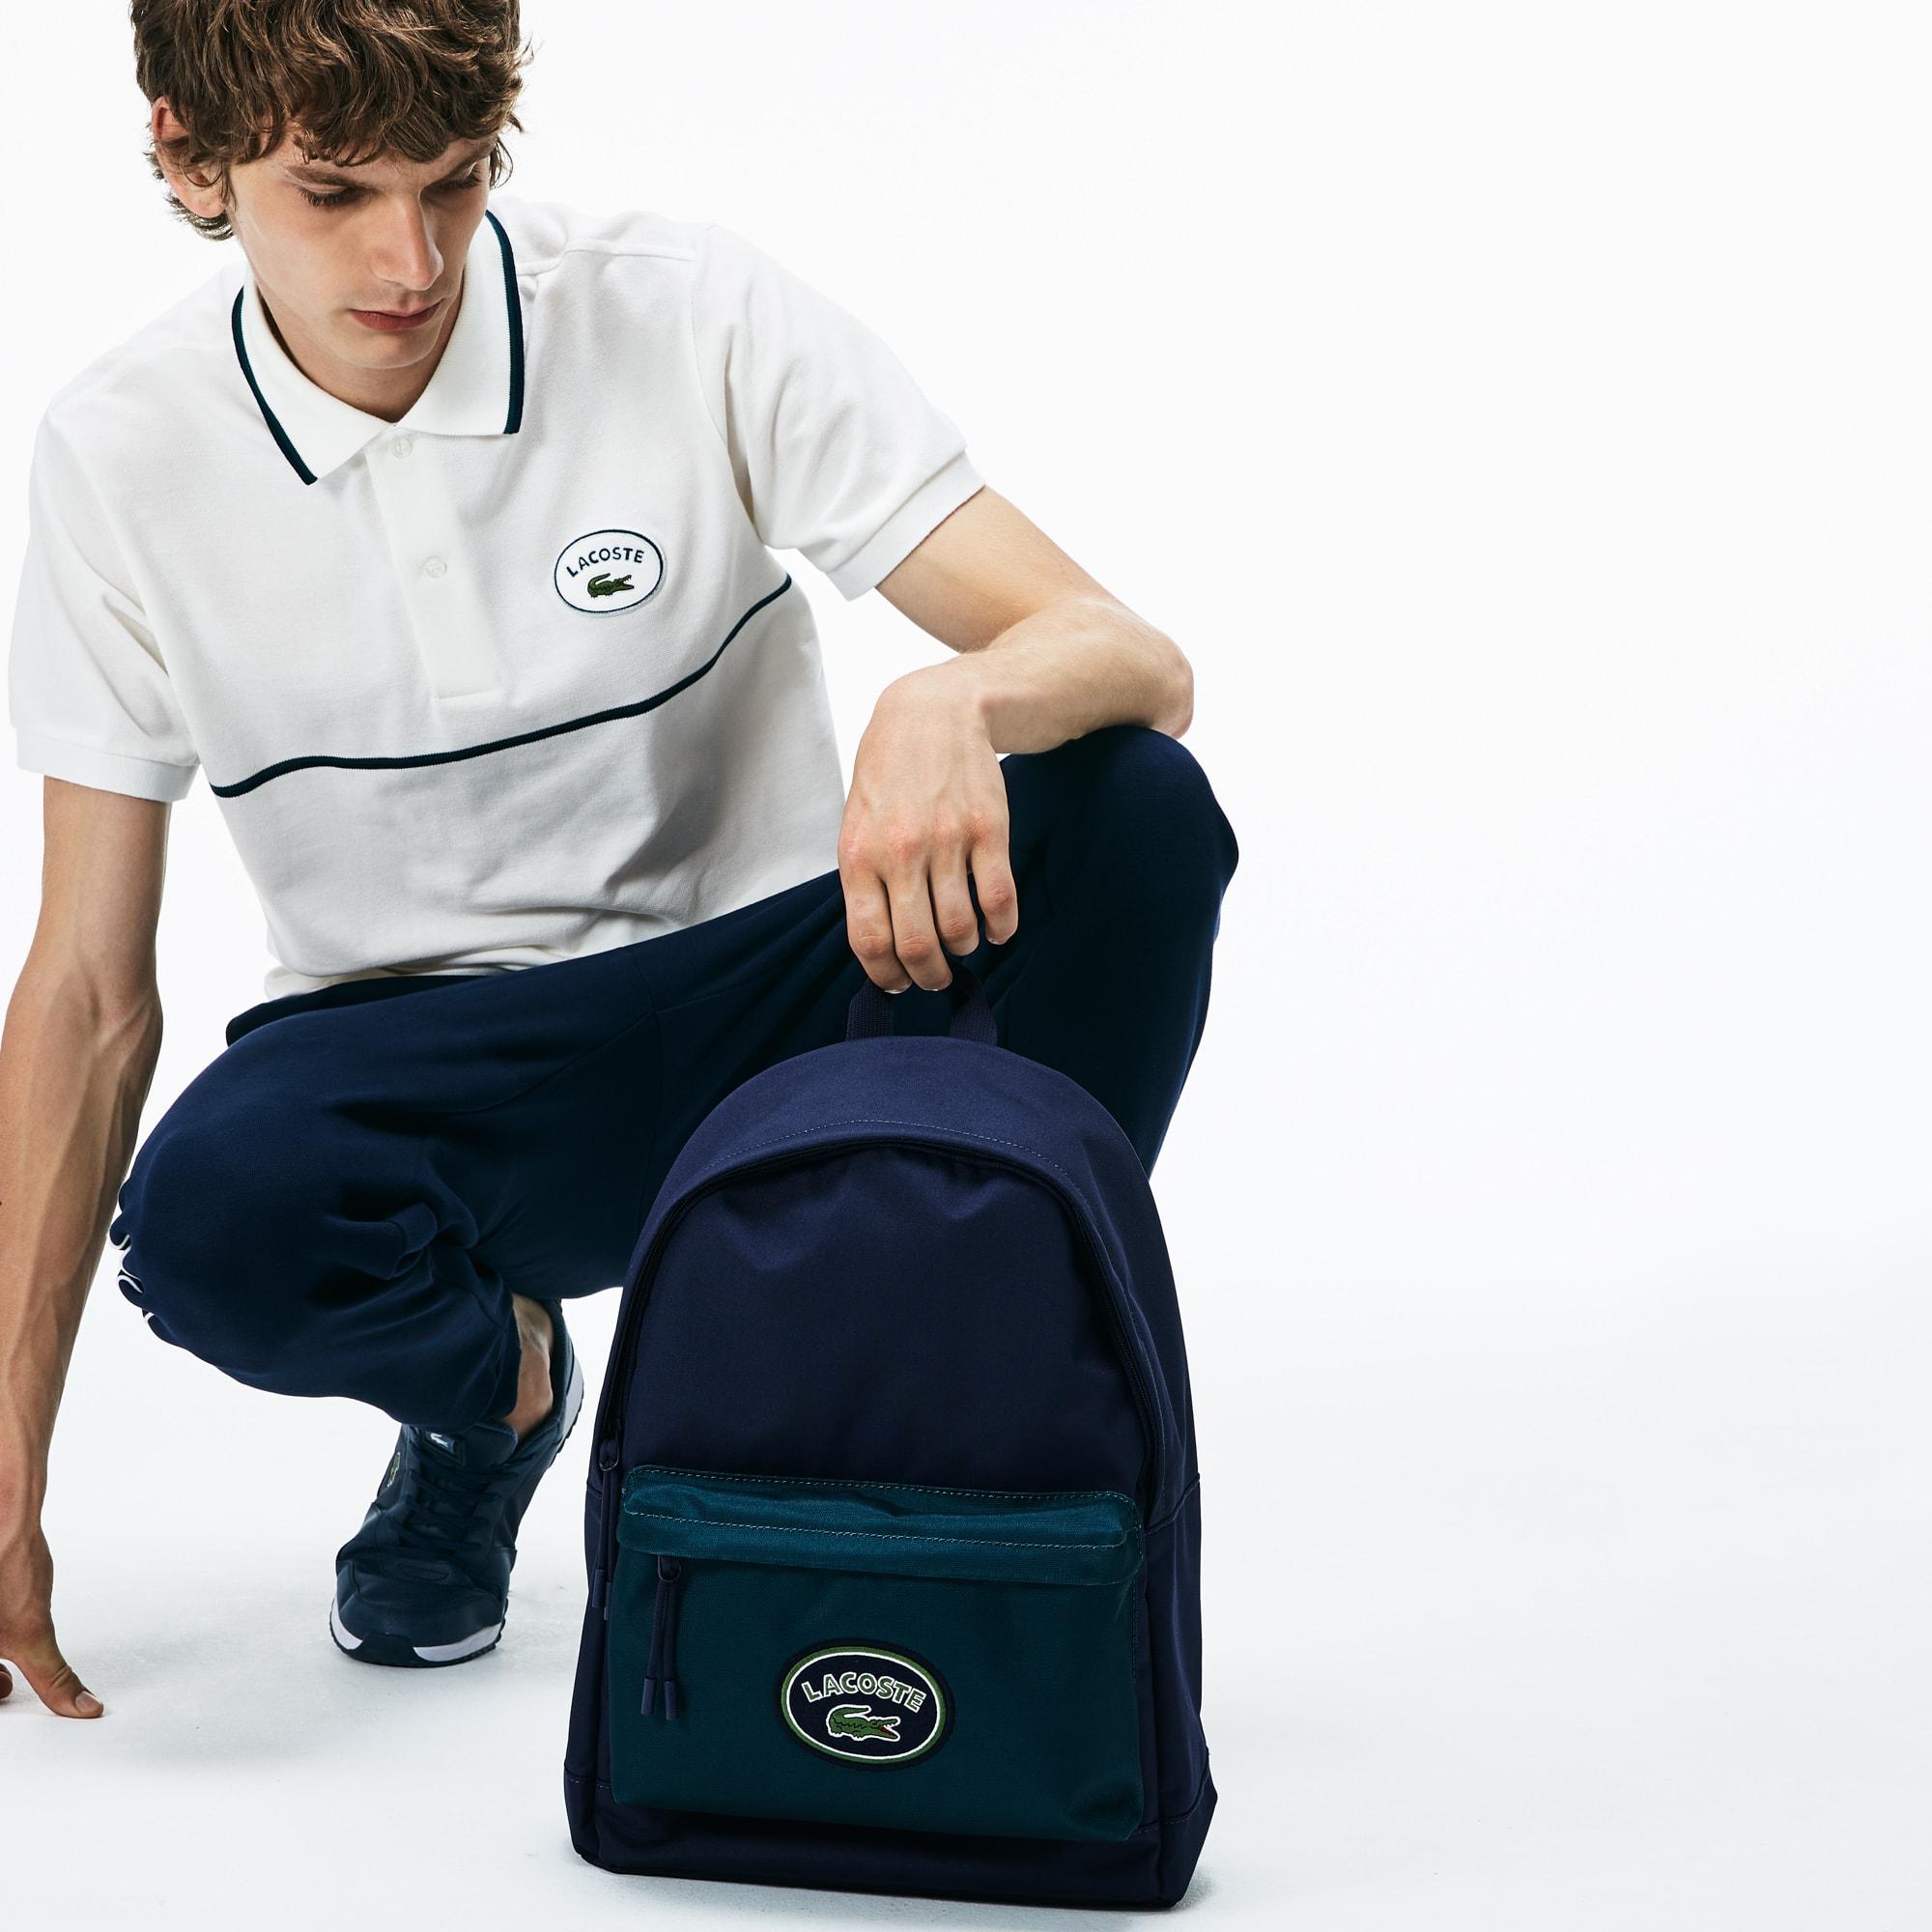 Men's Néocroc Lacoste Badge Colorblock Backpack